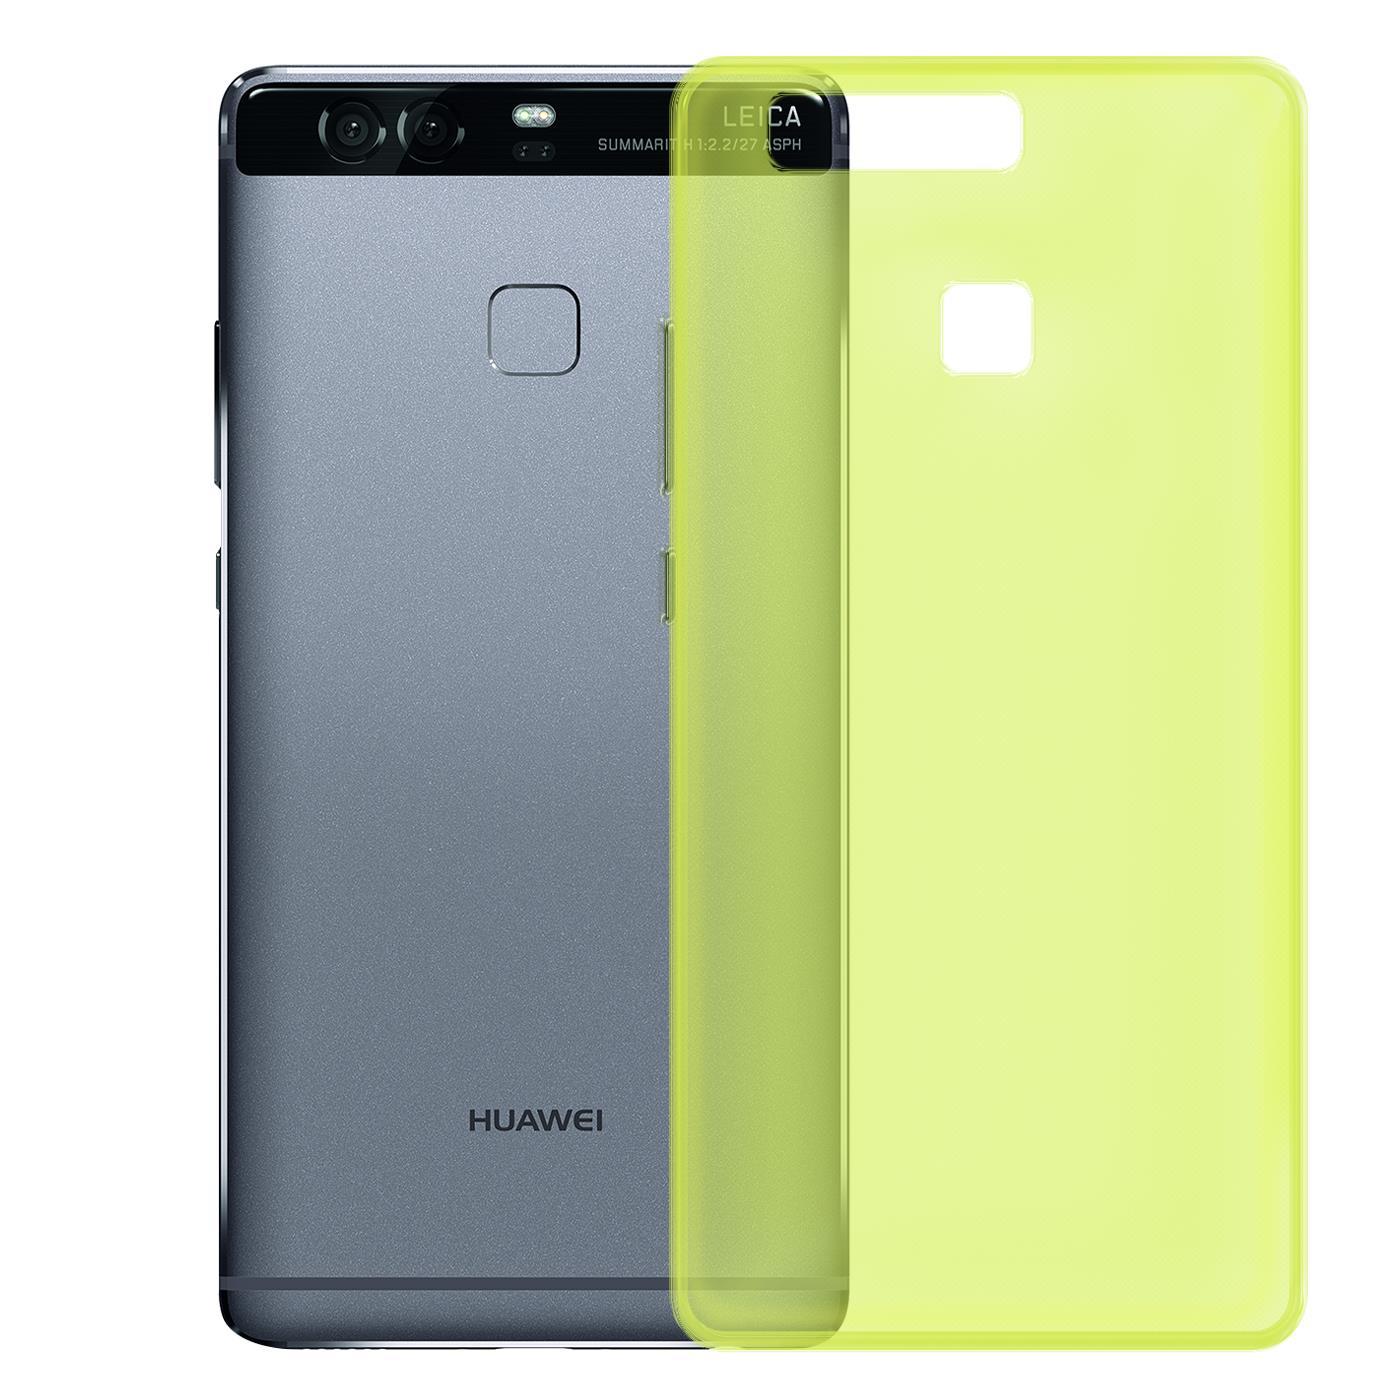 Huawei-p9-Duenn-Silikon-Klar-Case-Cover-Ultra-Slim-Stossfeste-Gel-Rueckseite Indexbild 12